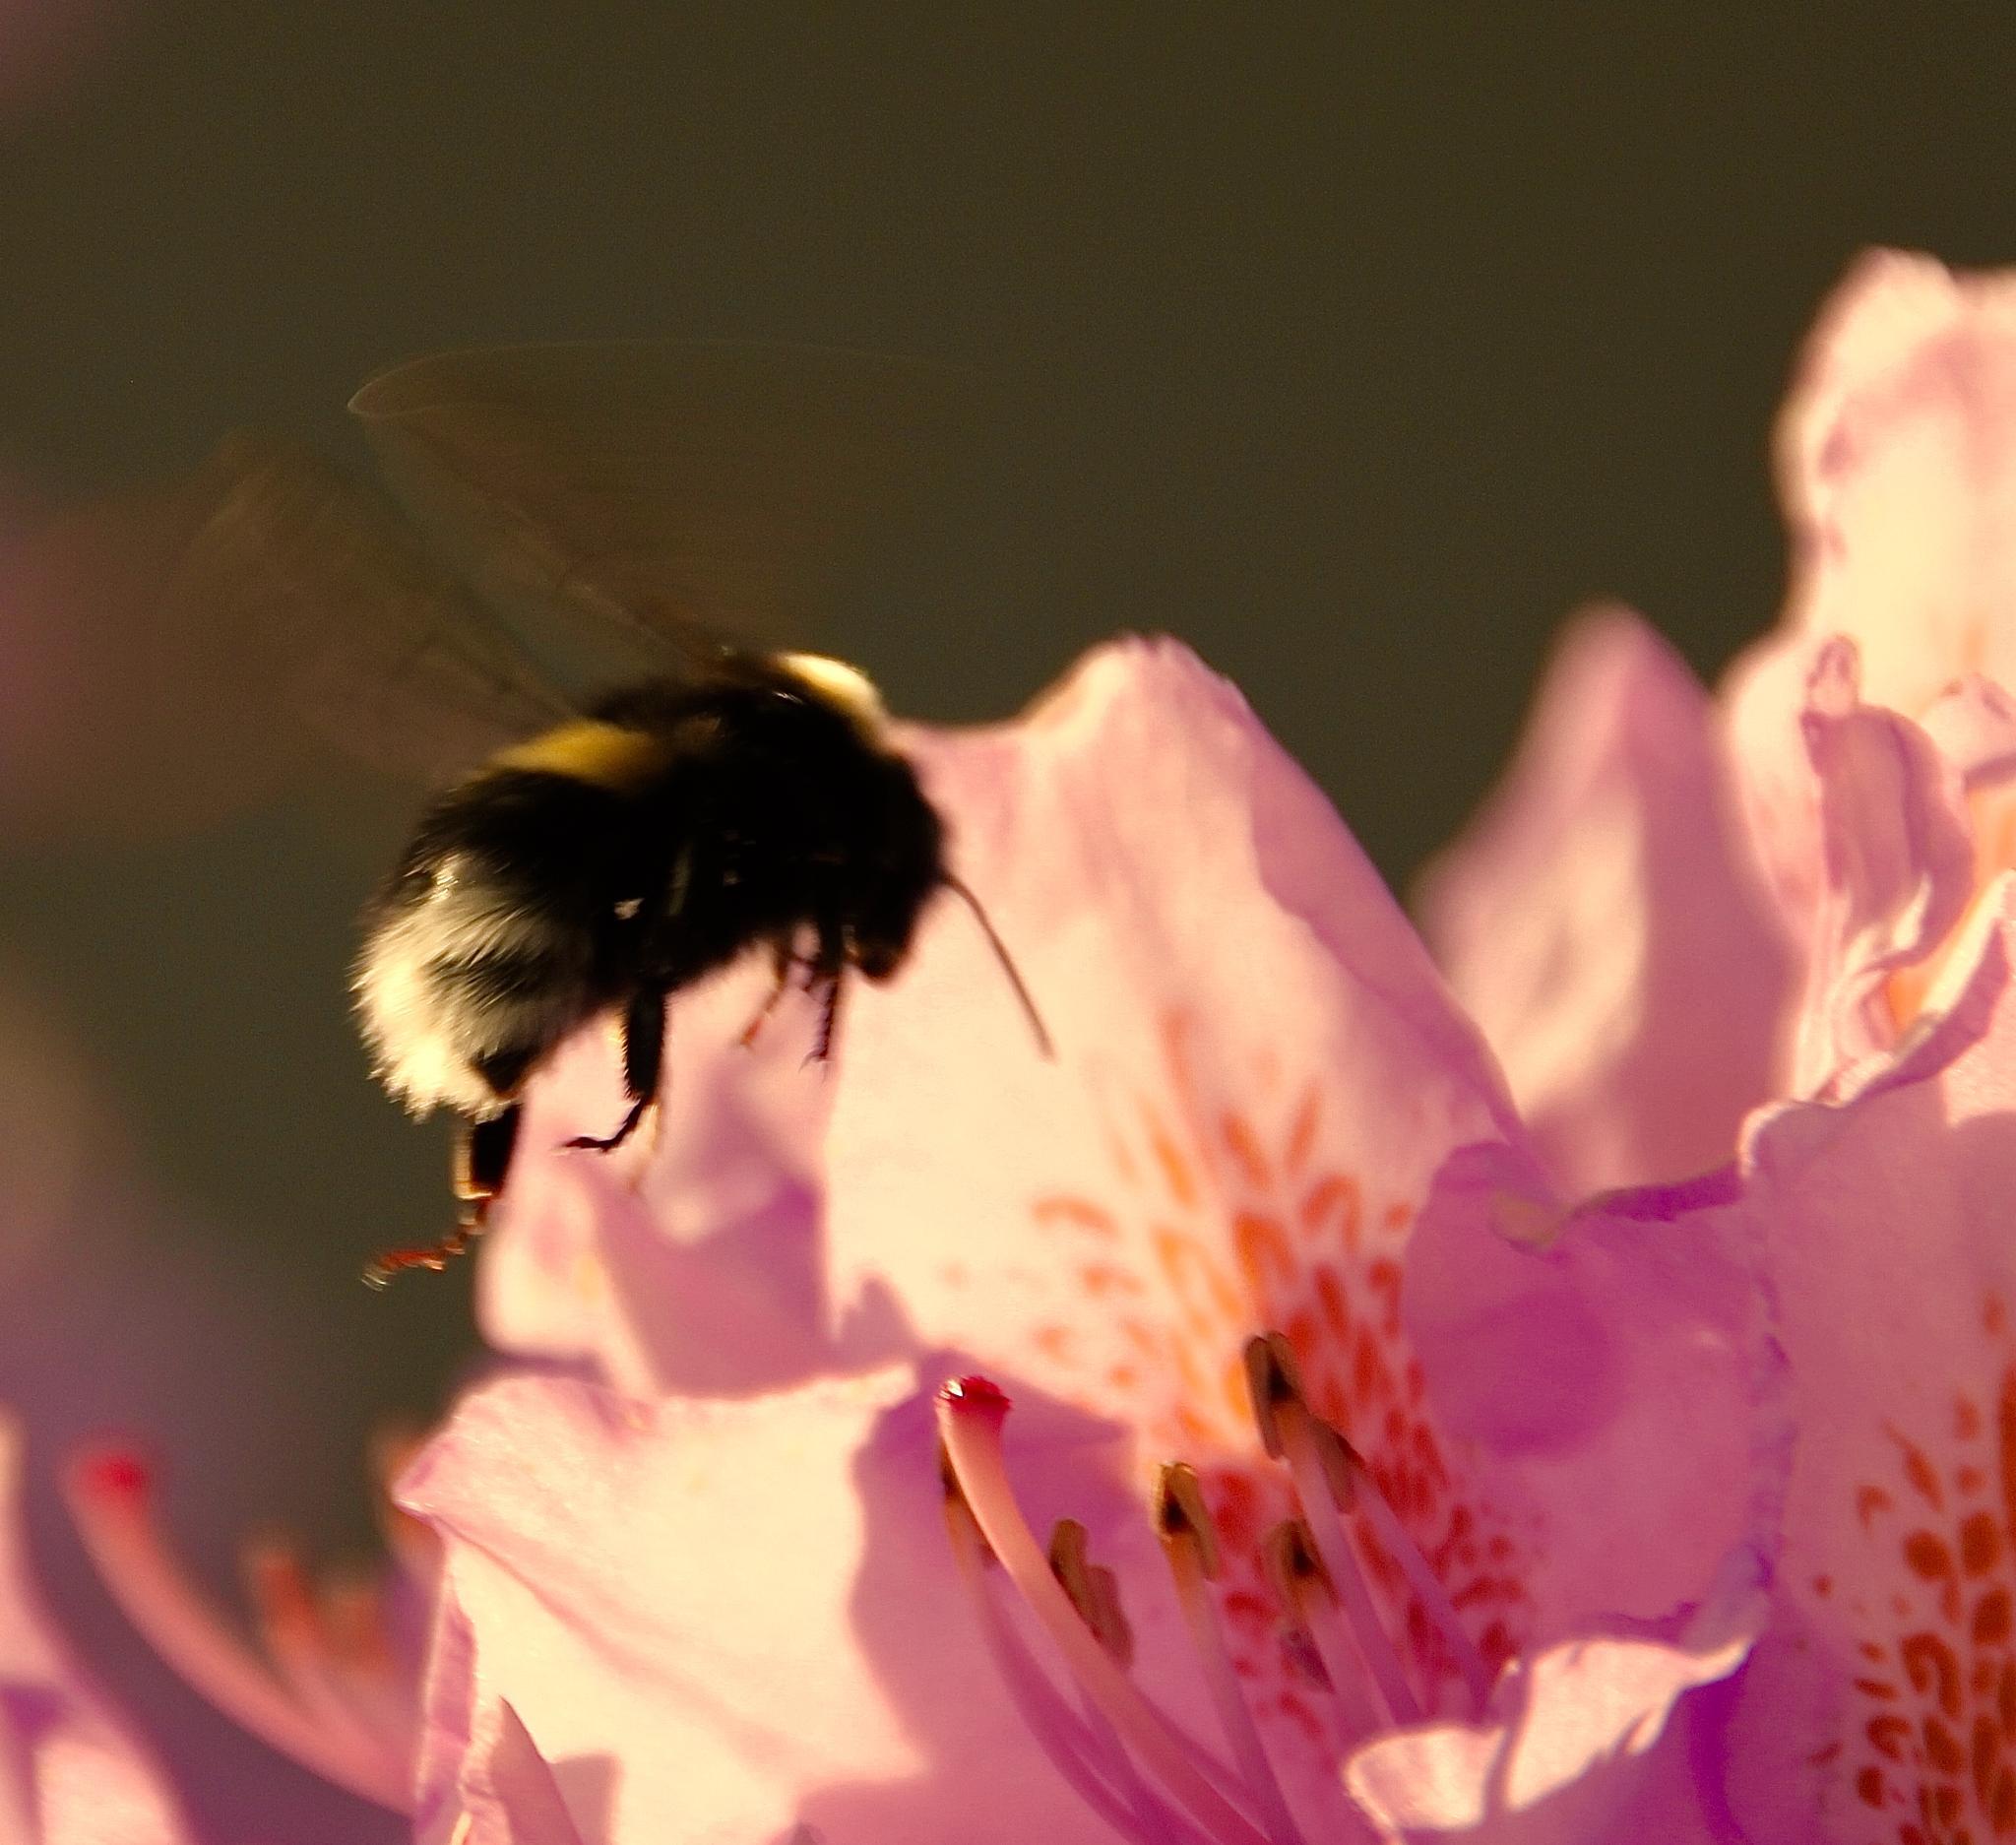 Bumblebiee vs Rododendro by Cecilie Hansteensen